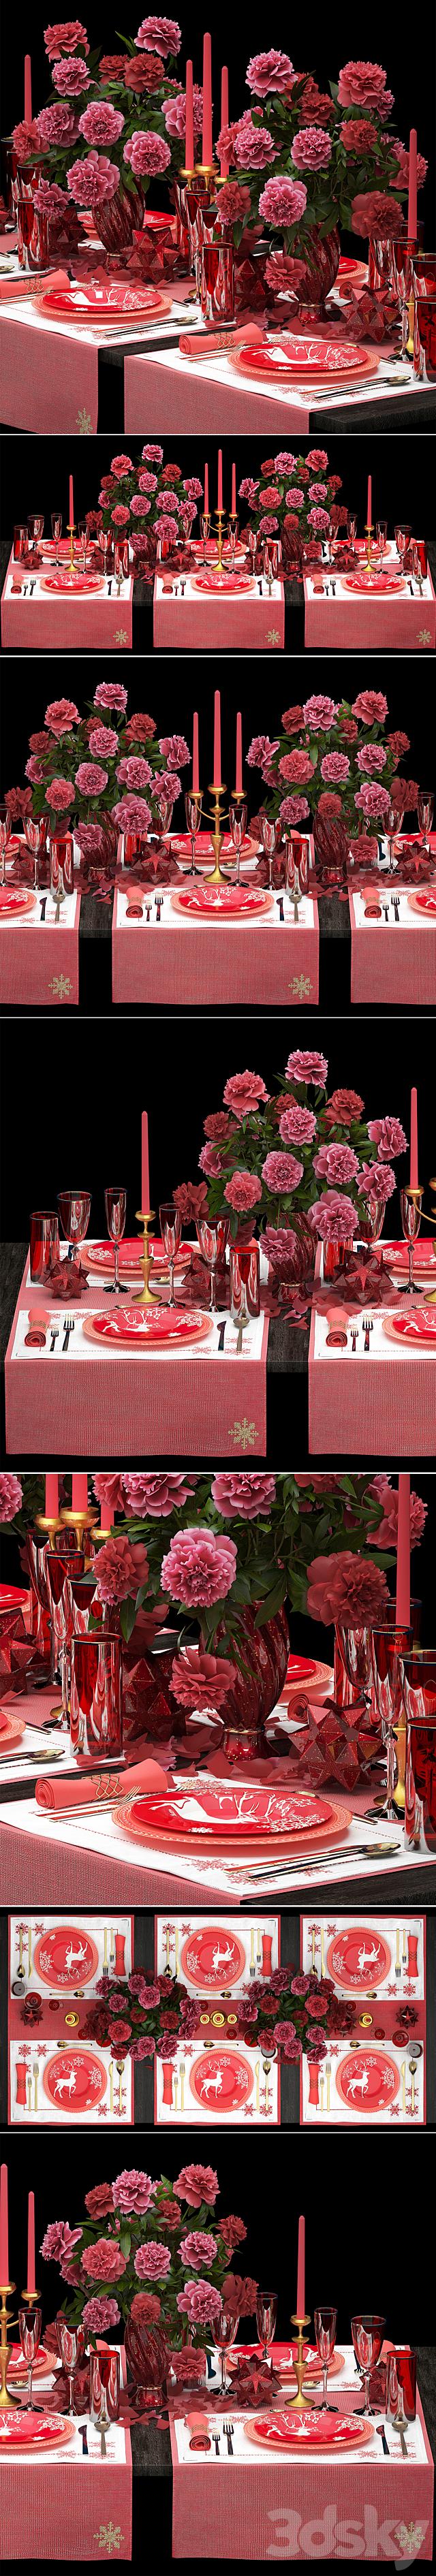 Table setting 5. ZARA HOME